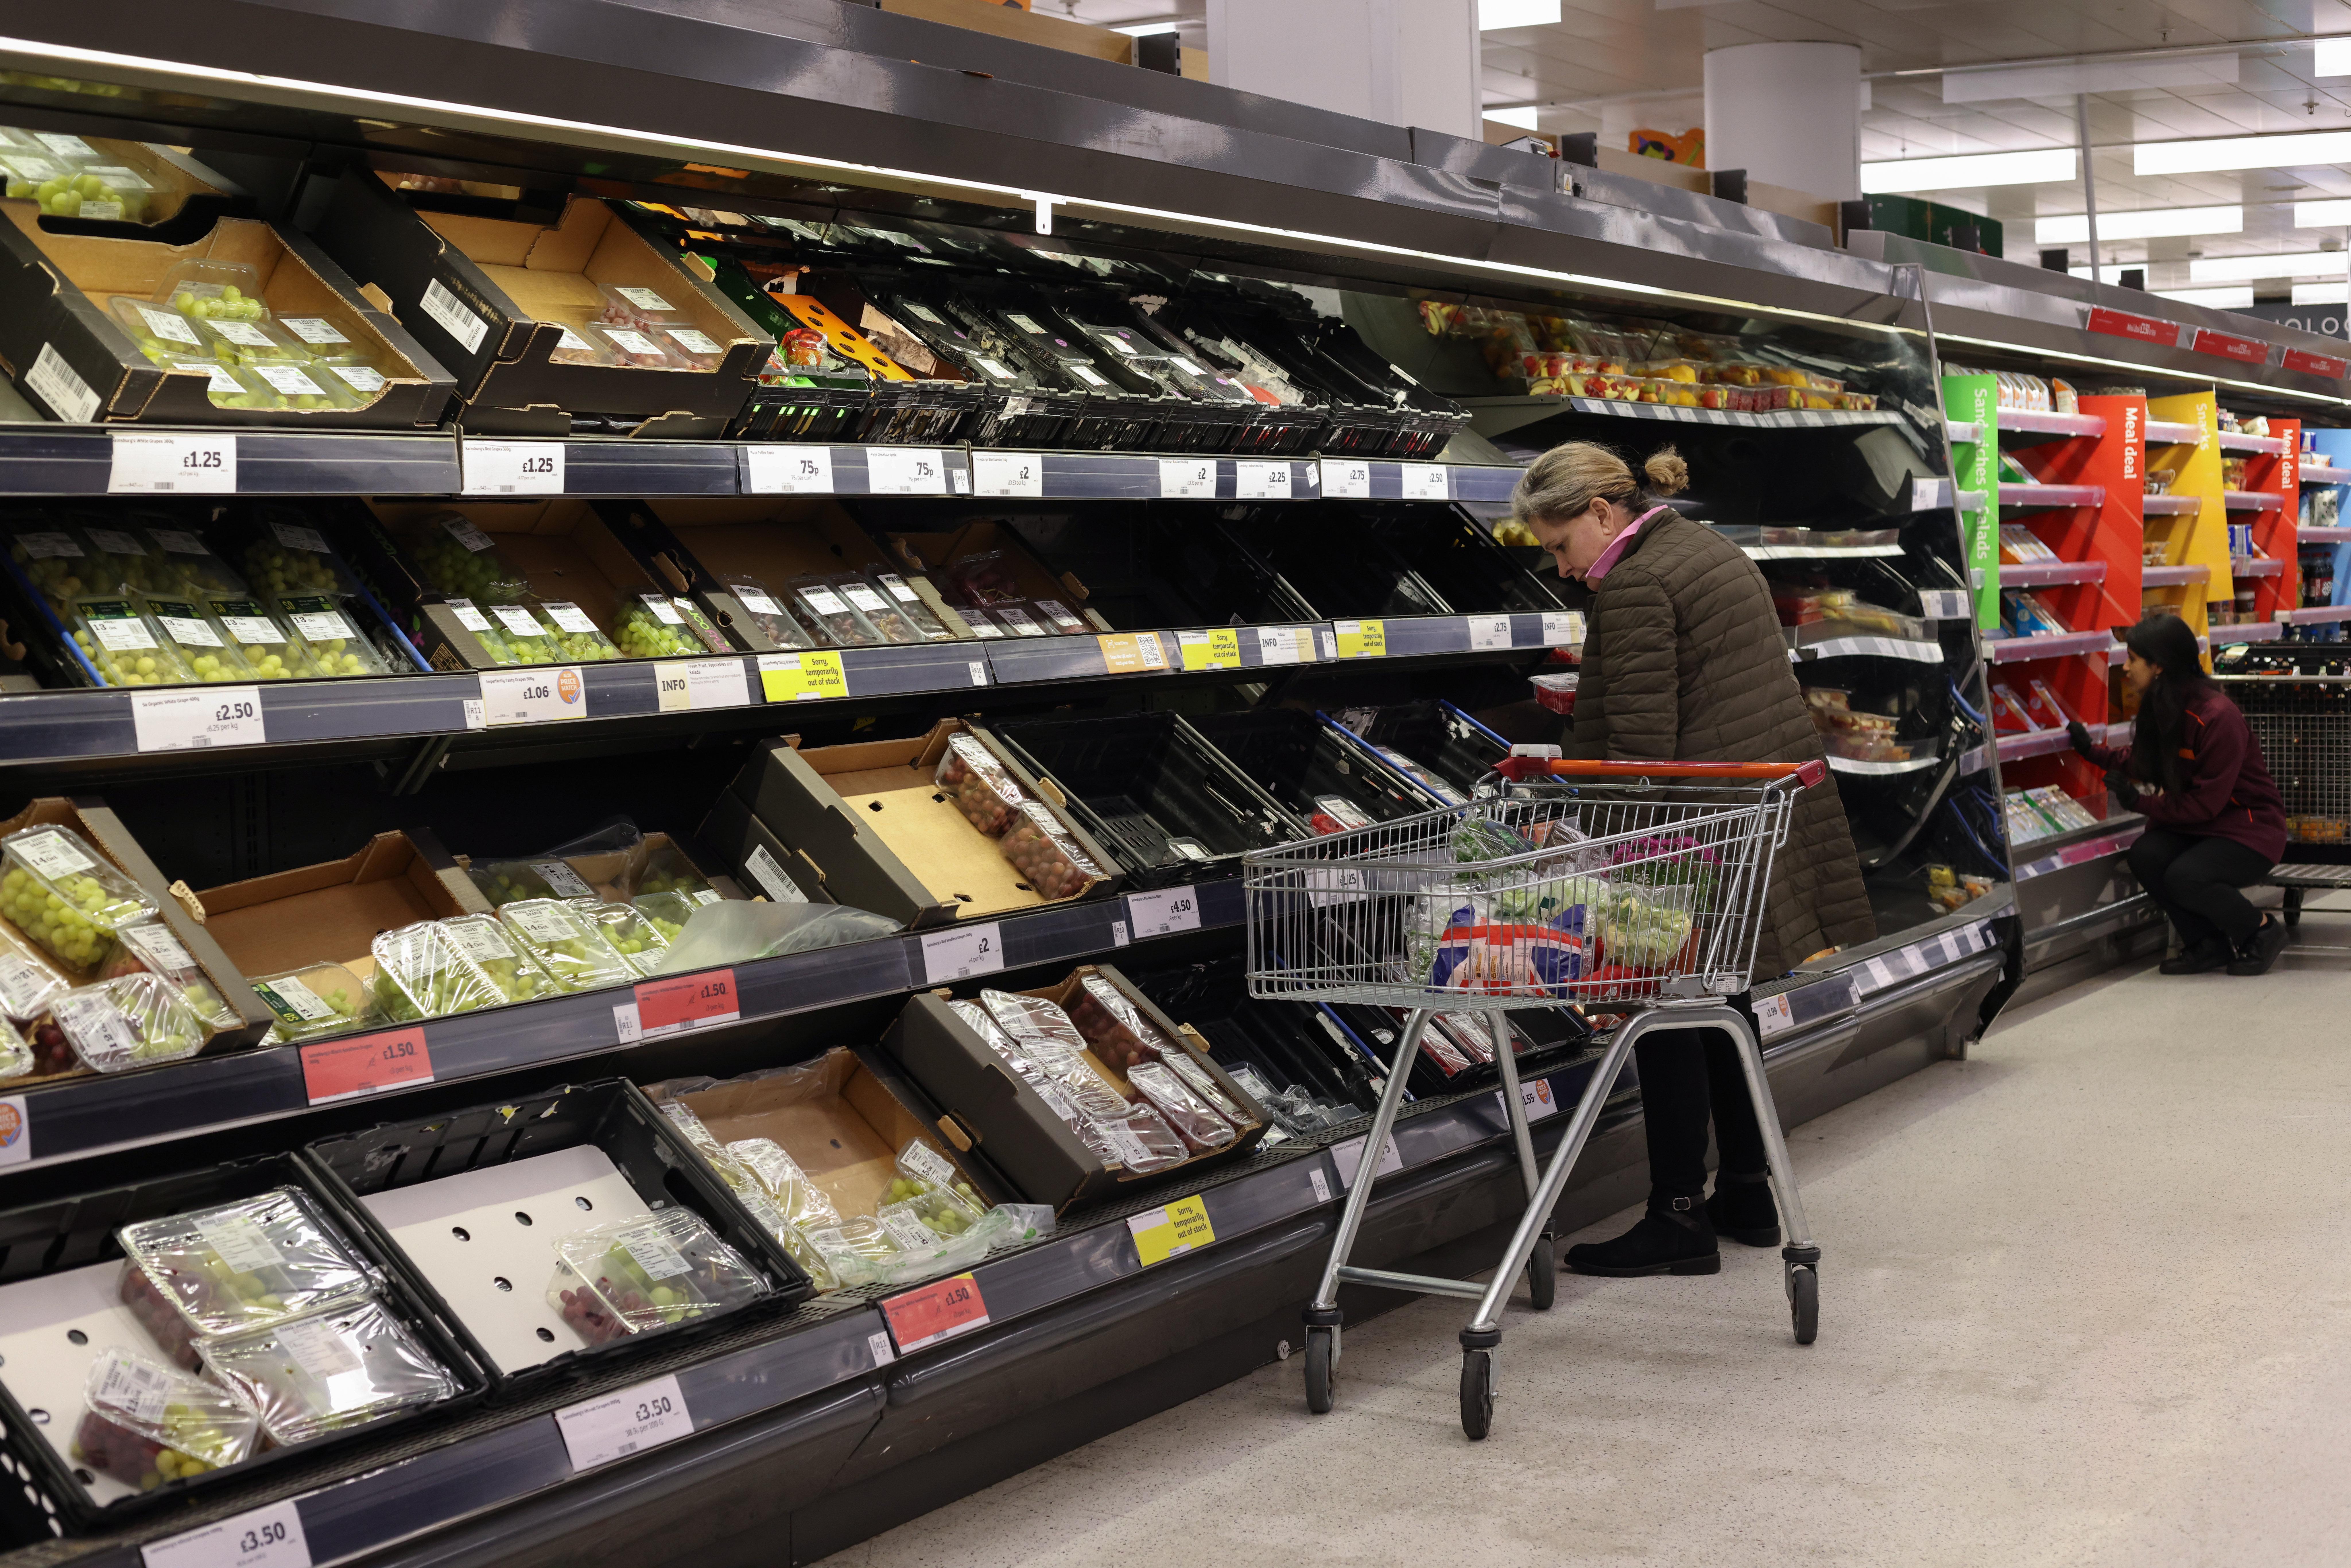 Empty Shelves Amid Supply Chain Disruptions Across UK